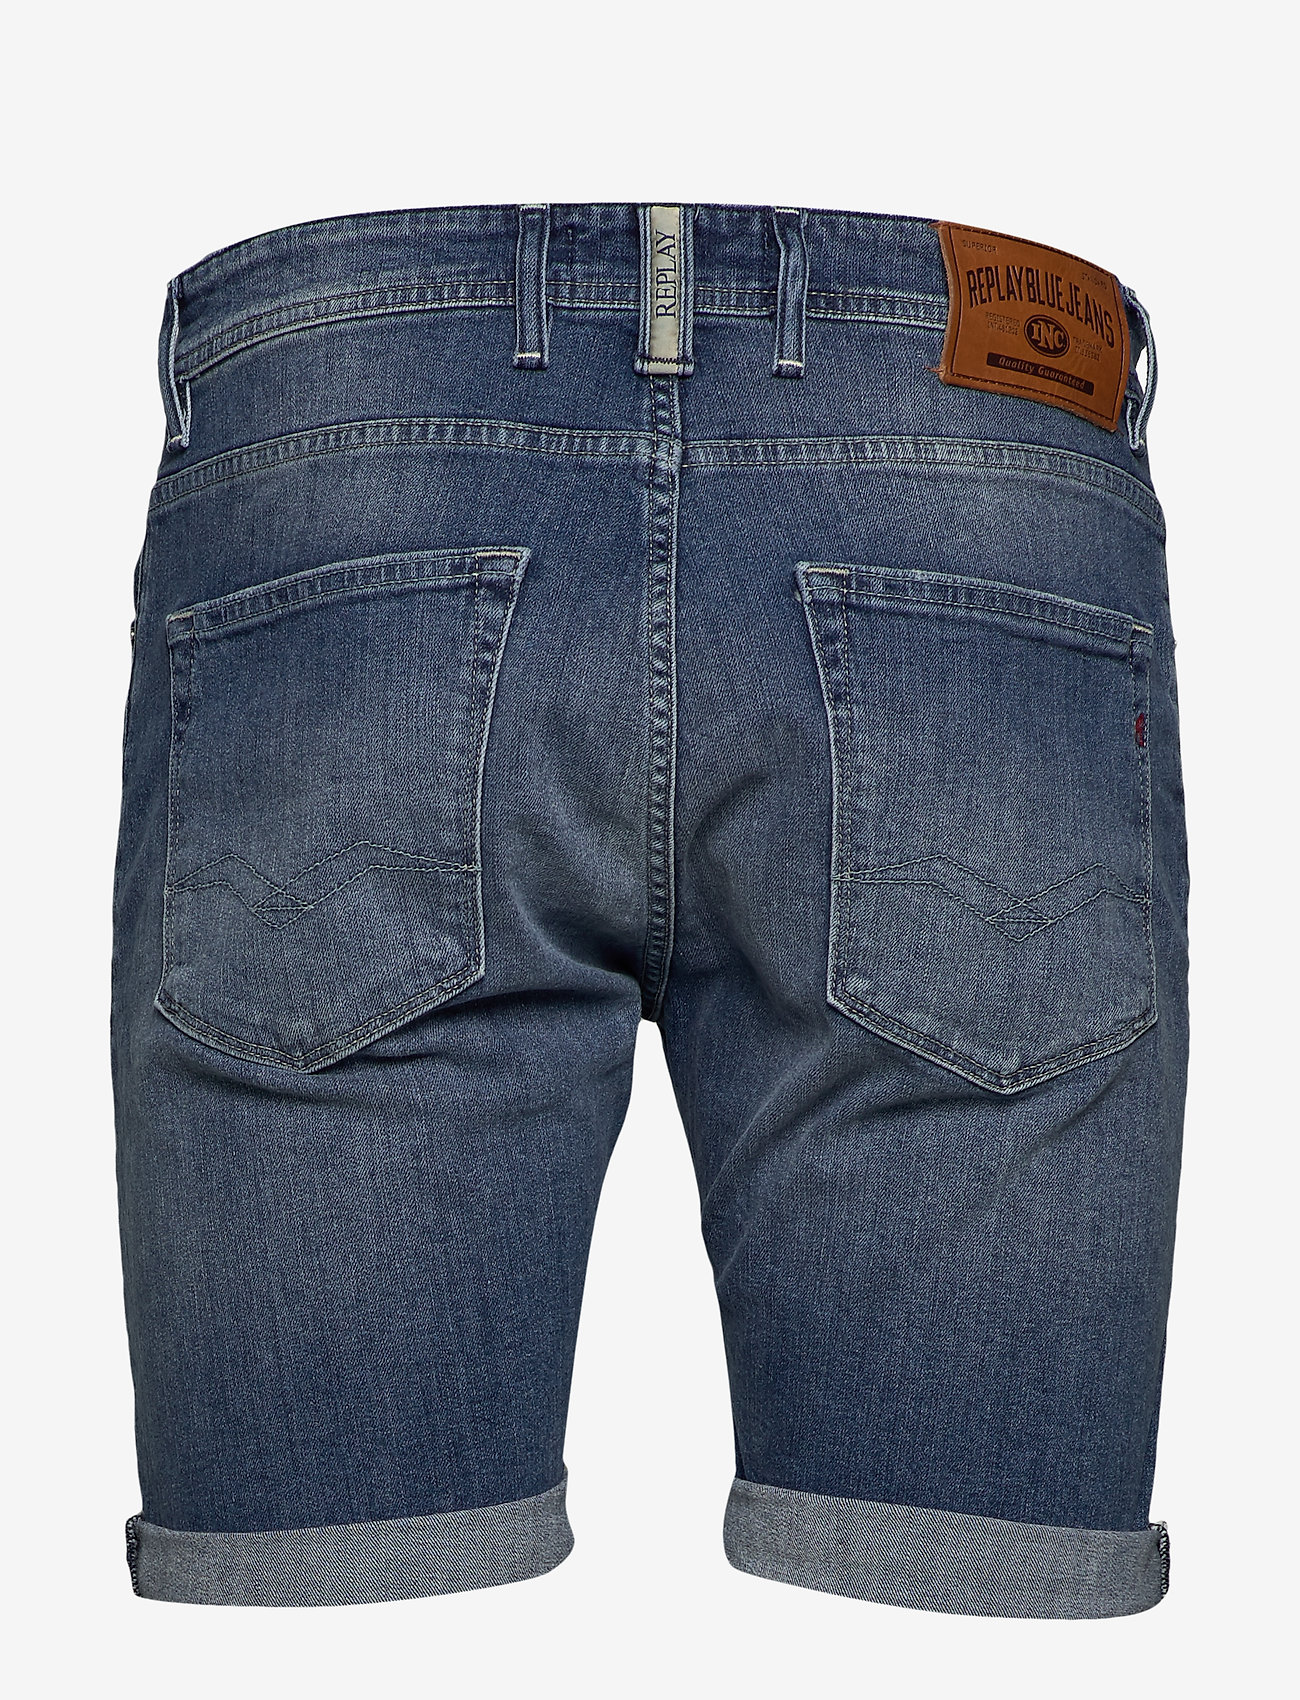 Replay - RBJ.901 SHORT - denim shorts - medium blue - 1